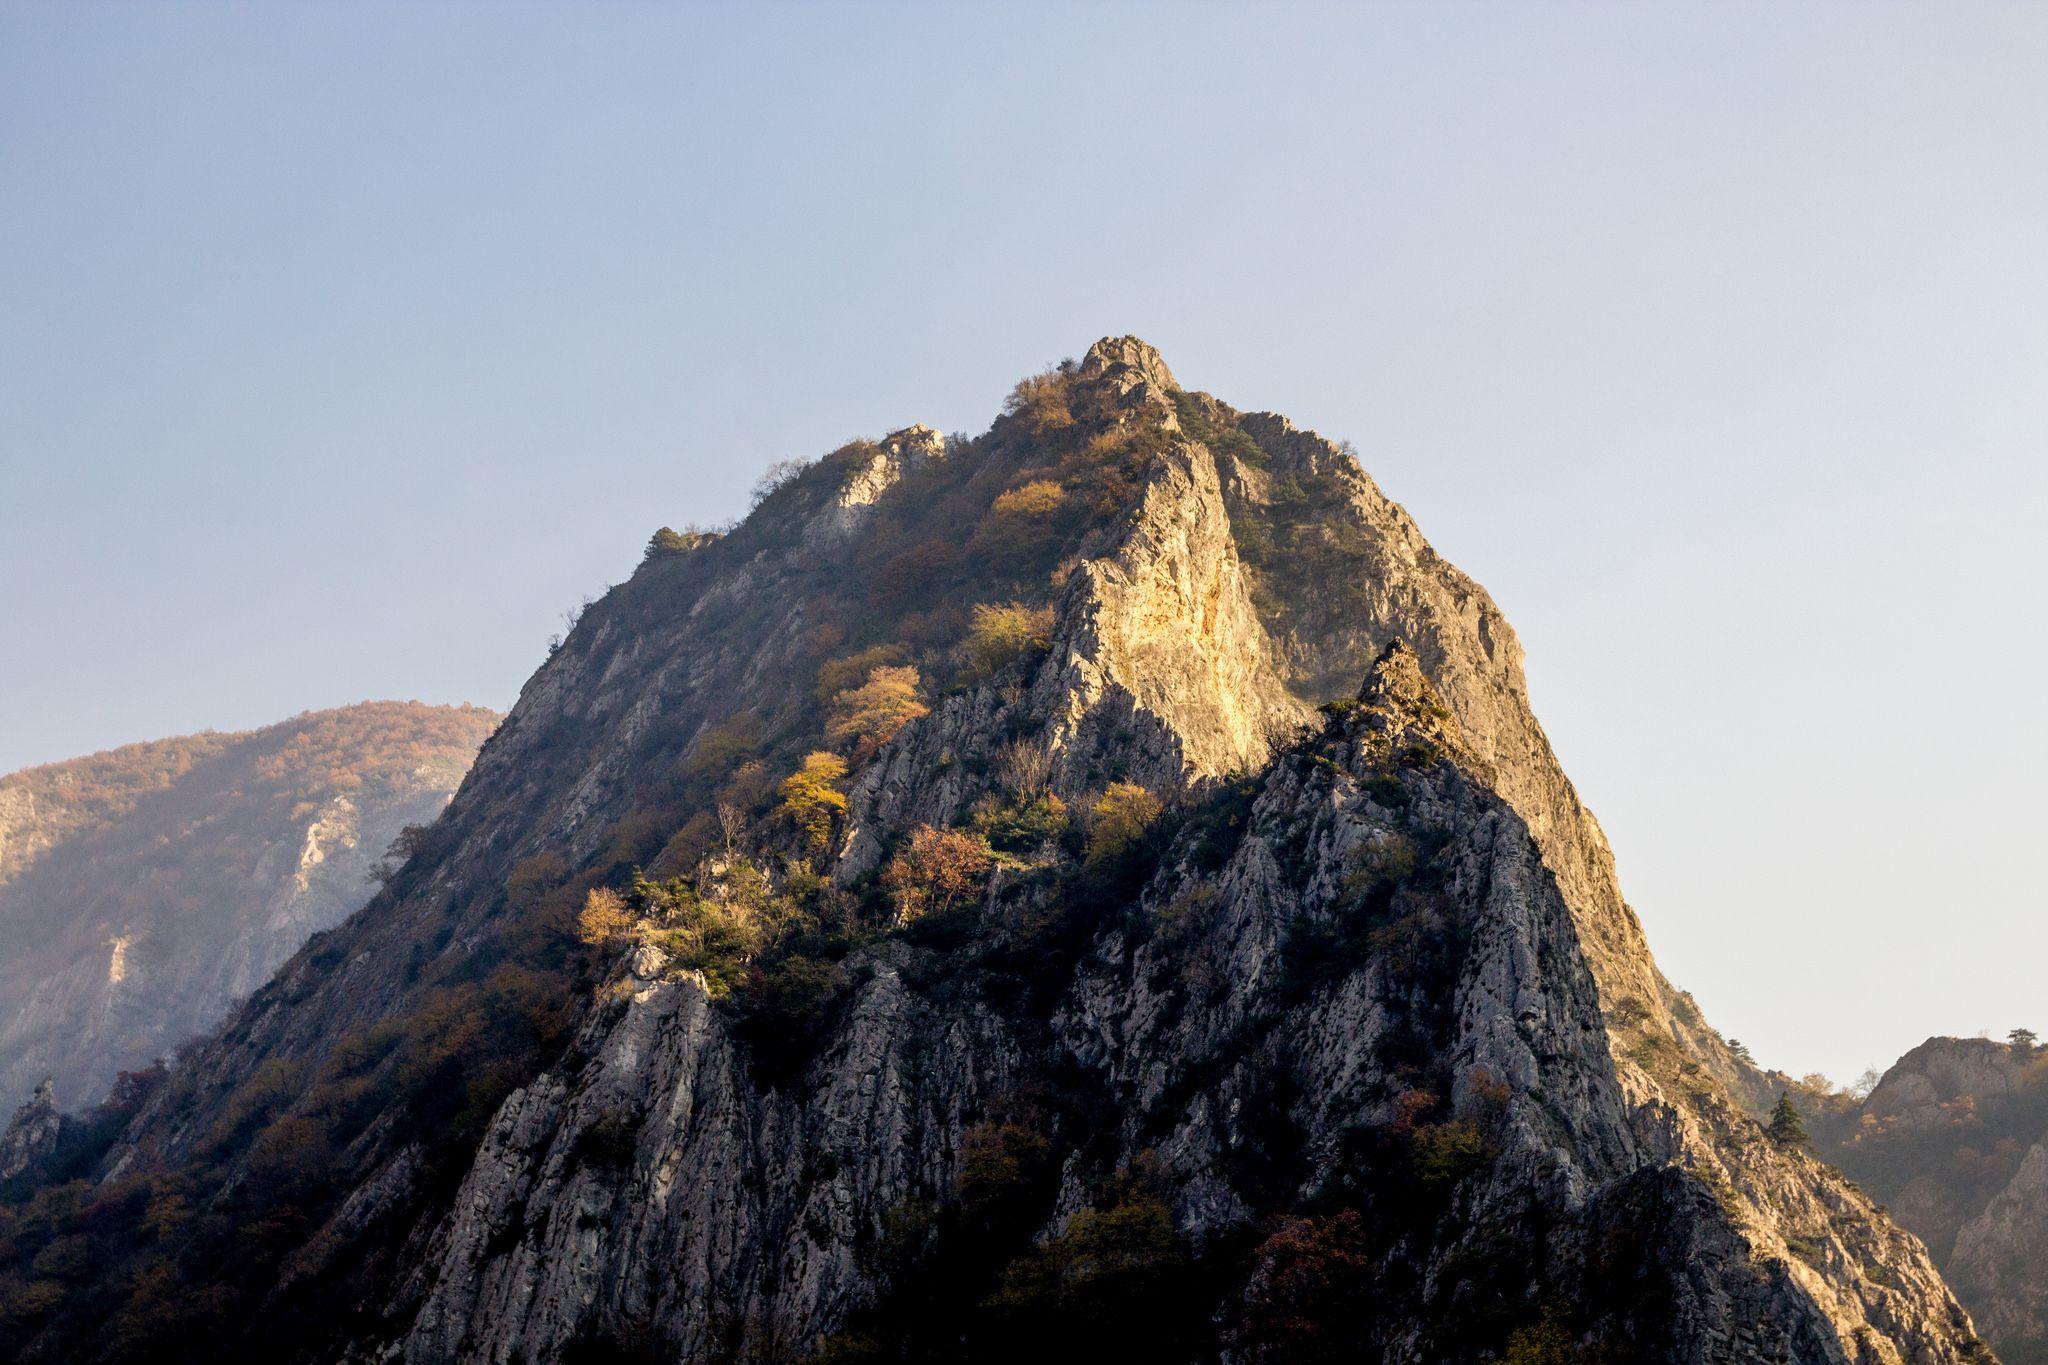 Matka canyon Skopje Macedônia [OC][2048x1365] Skopje